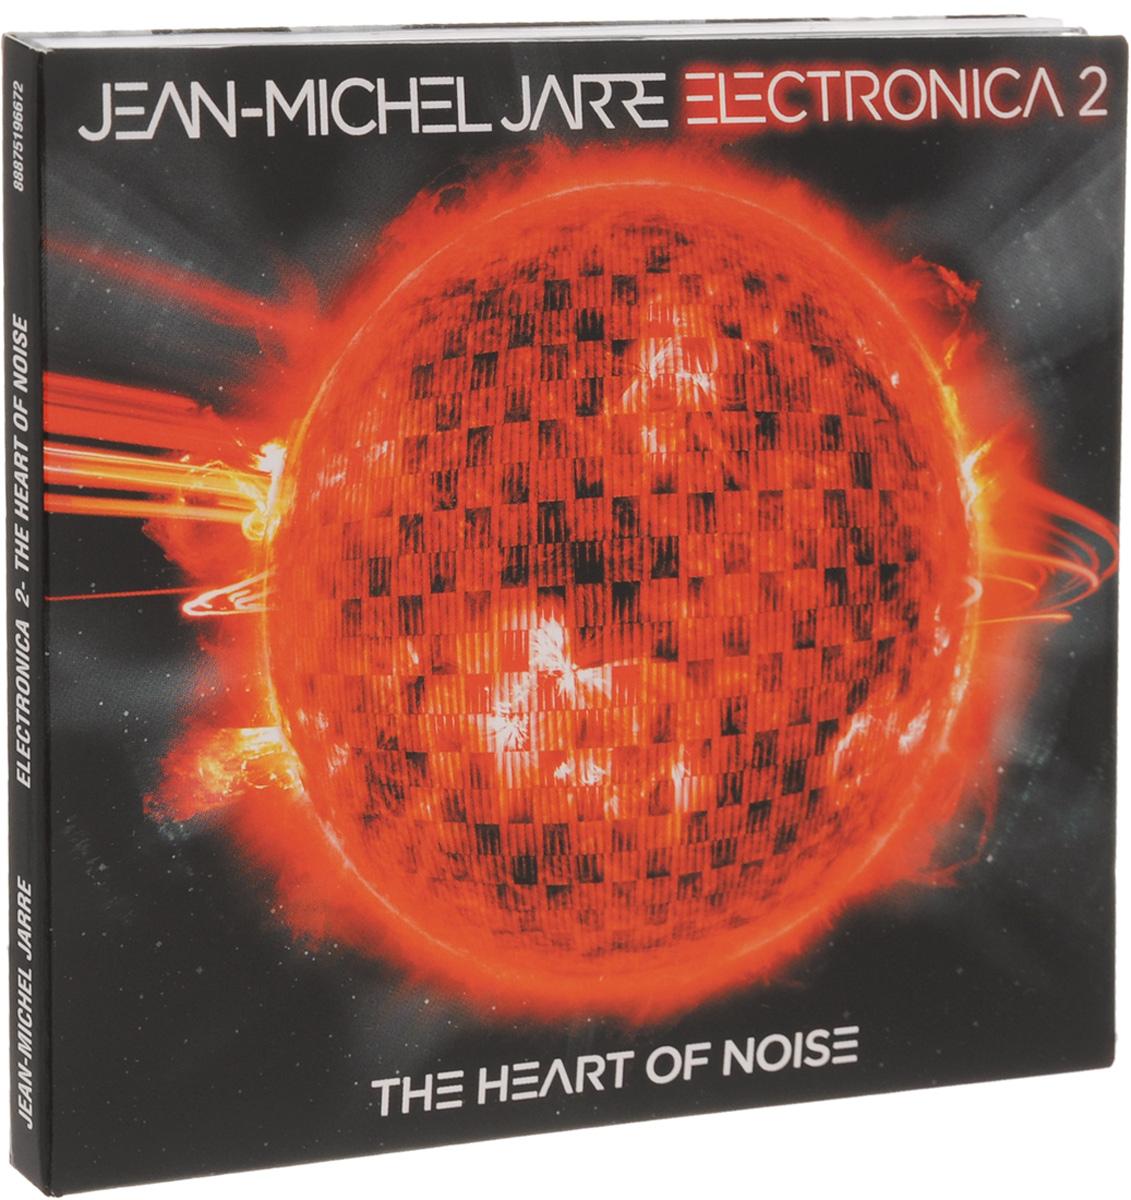 Jean-Michel Jarre. Electronica 2 - The Heart Of Noise